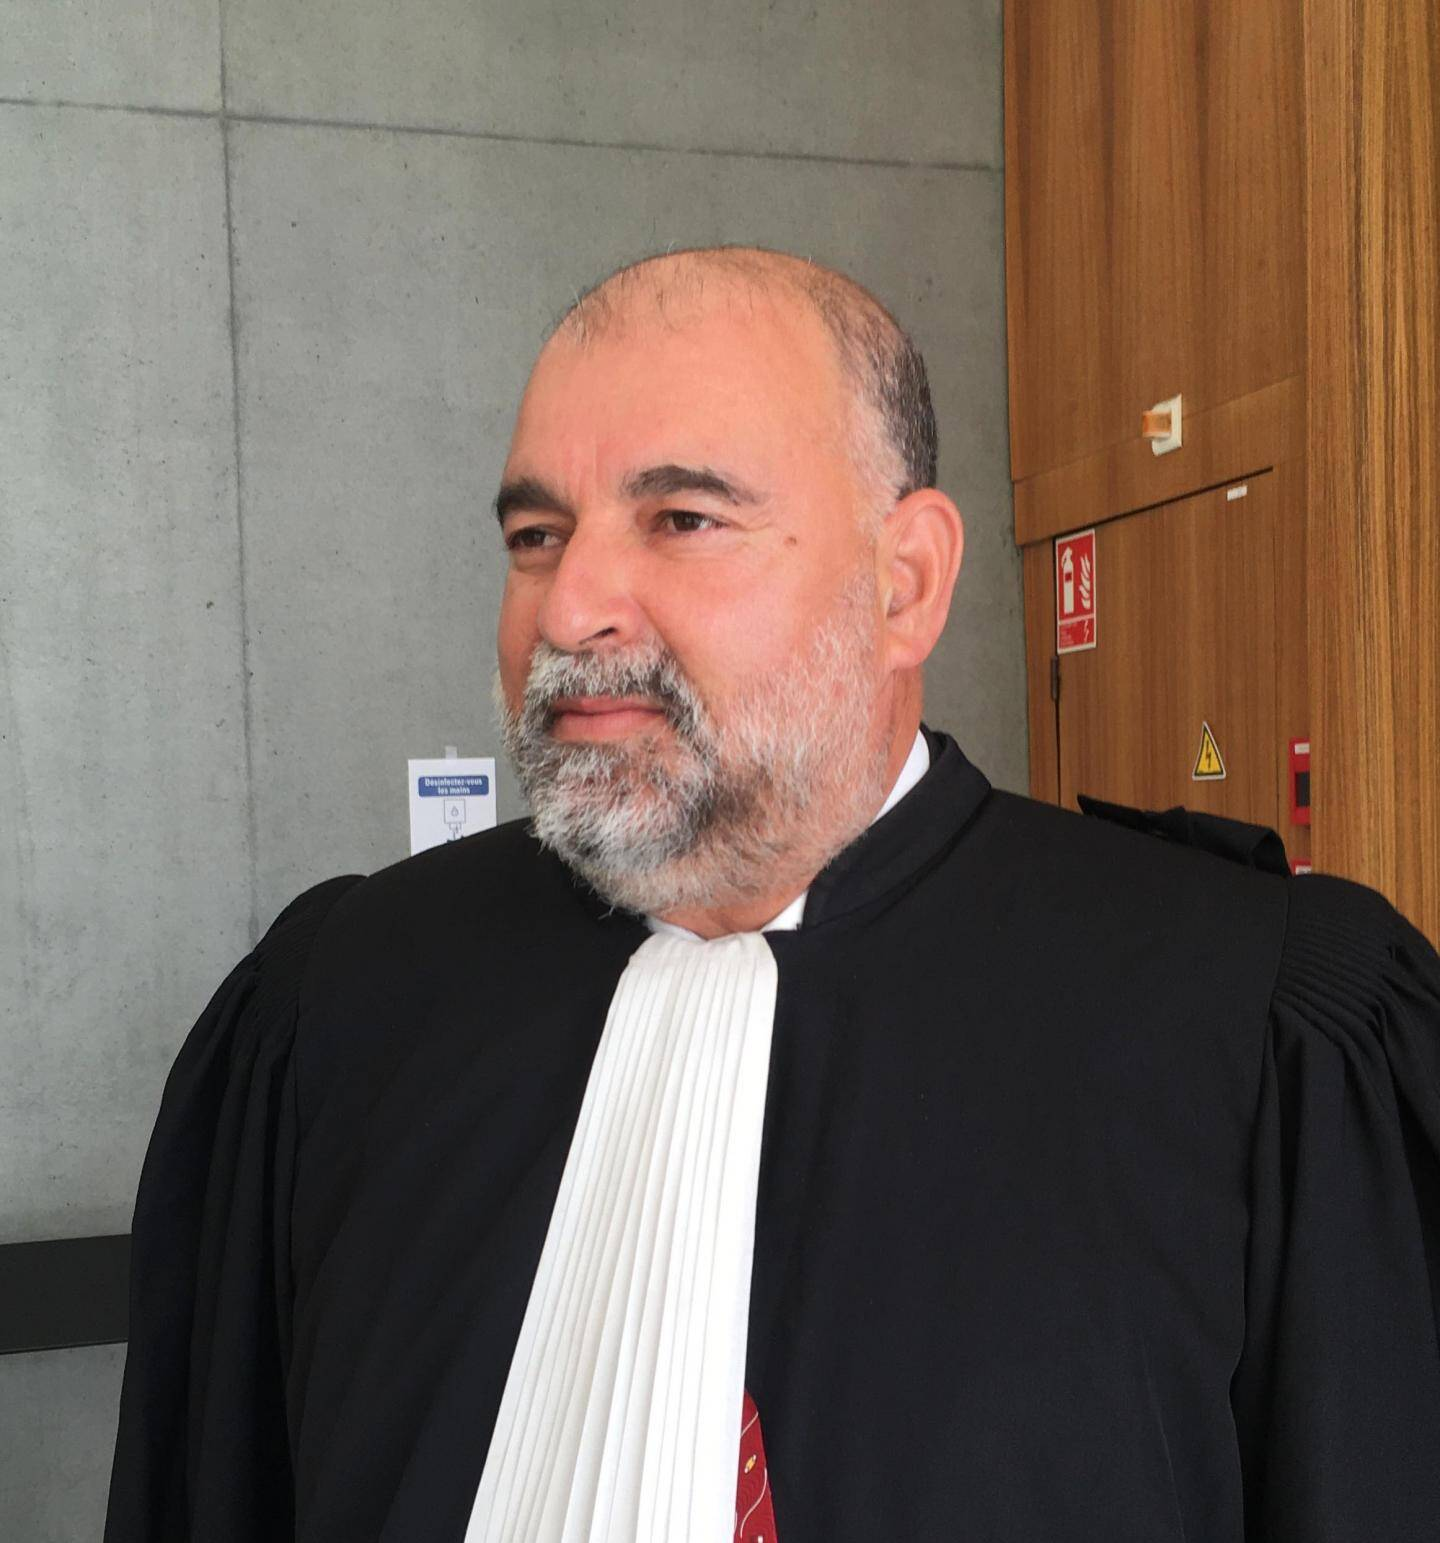 Me Adam Krid, avocat de la défense.